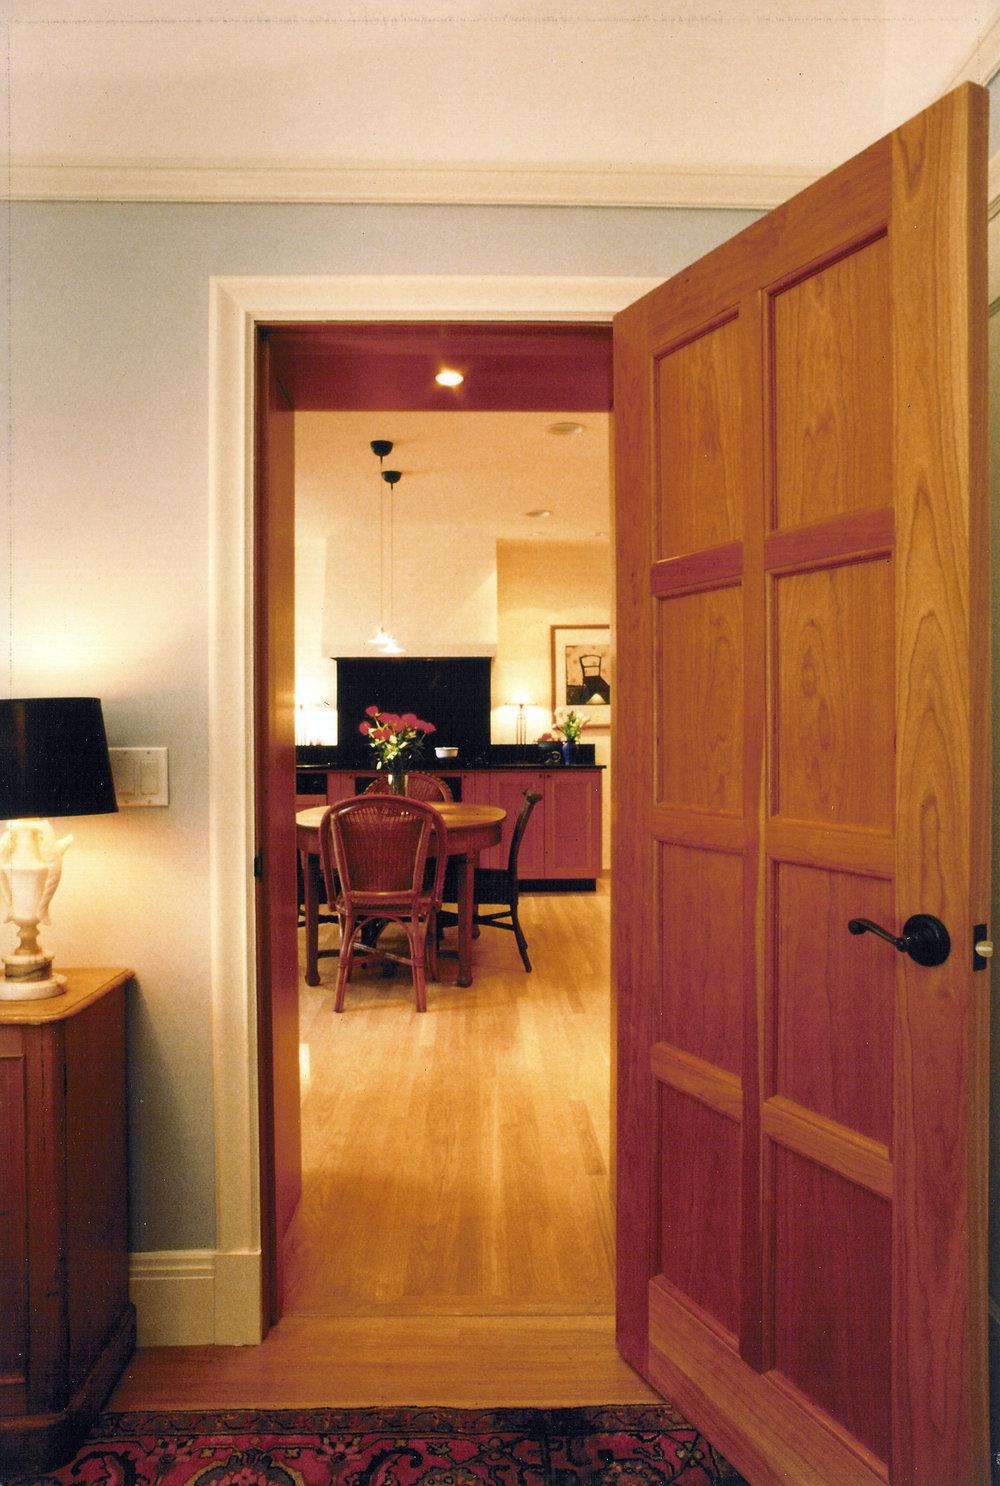 Kaplan-Architects-Berkeley-guest-room-view-to-kitchen.jpg